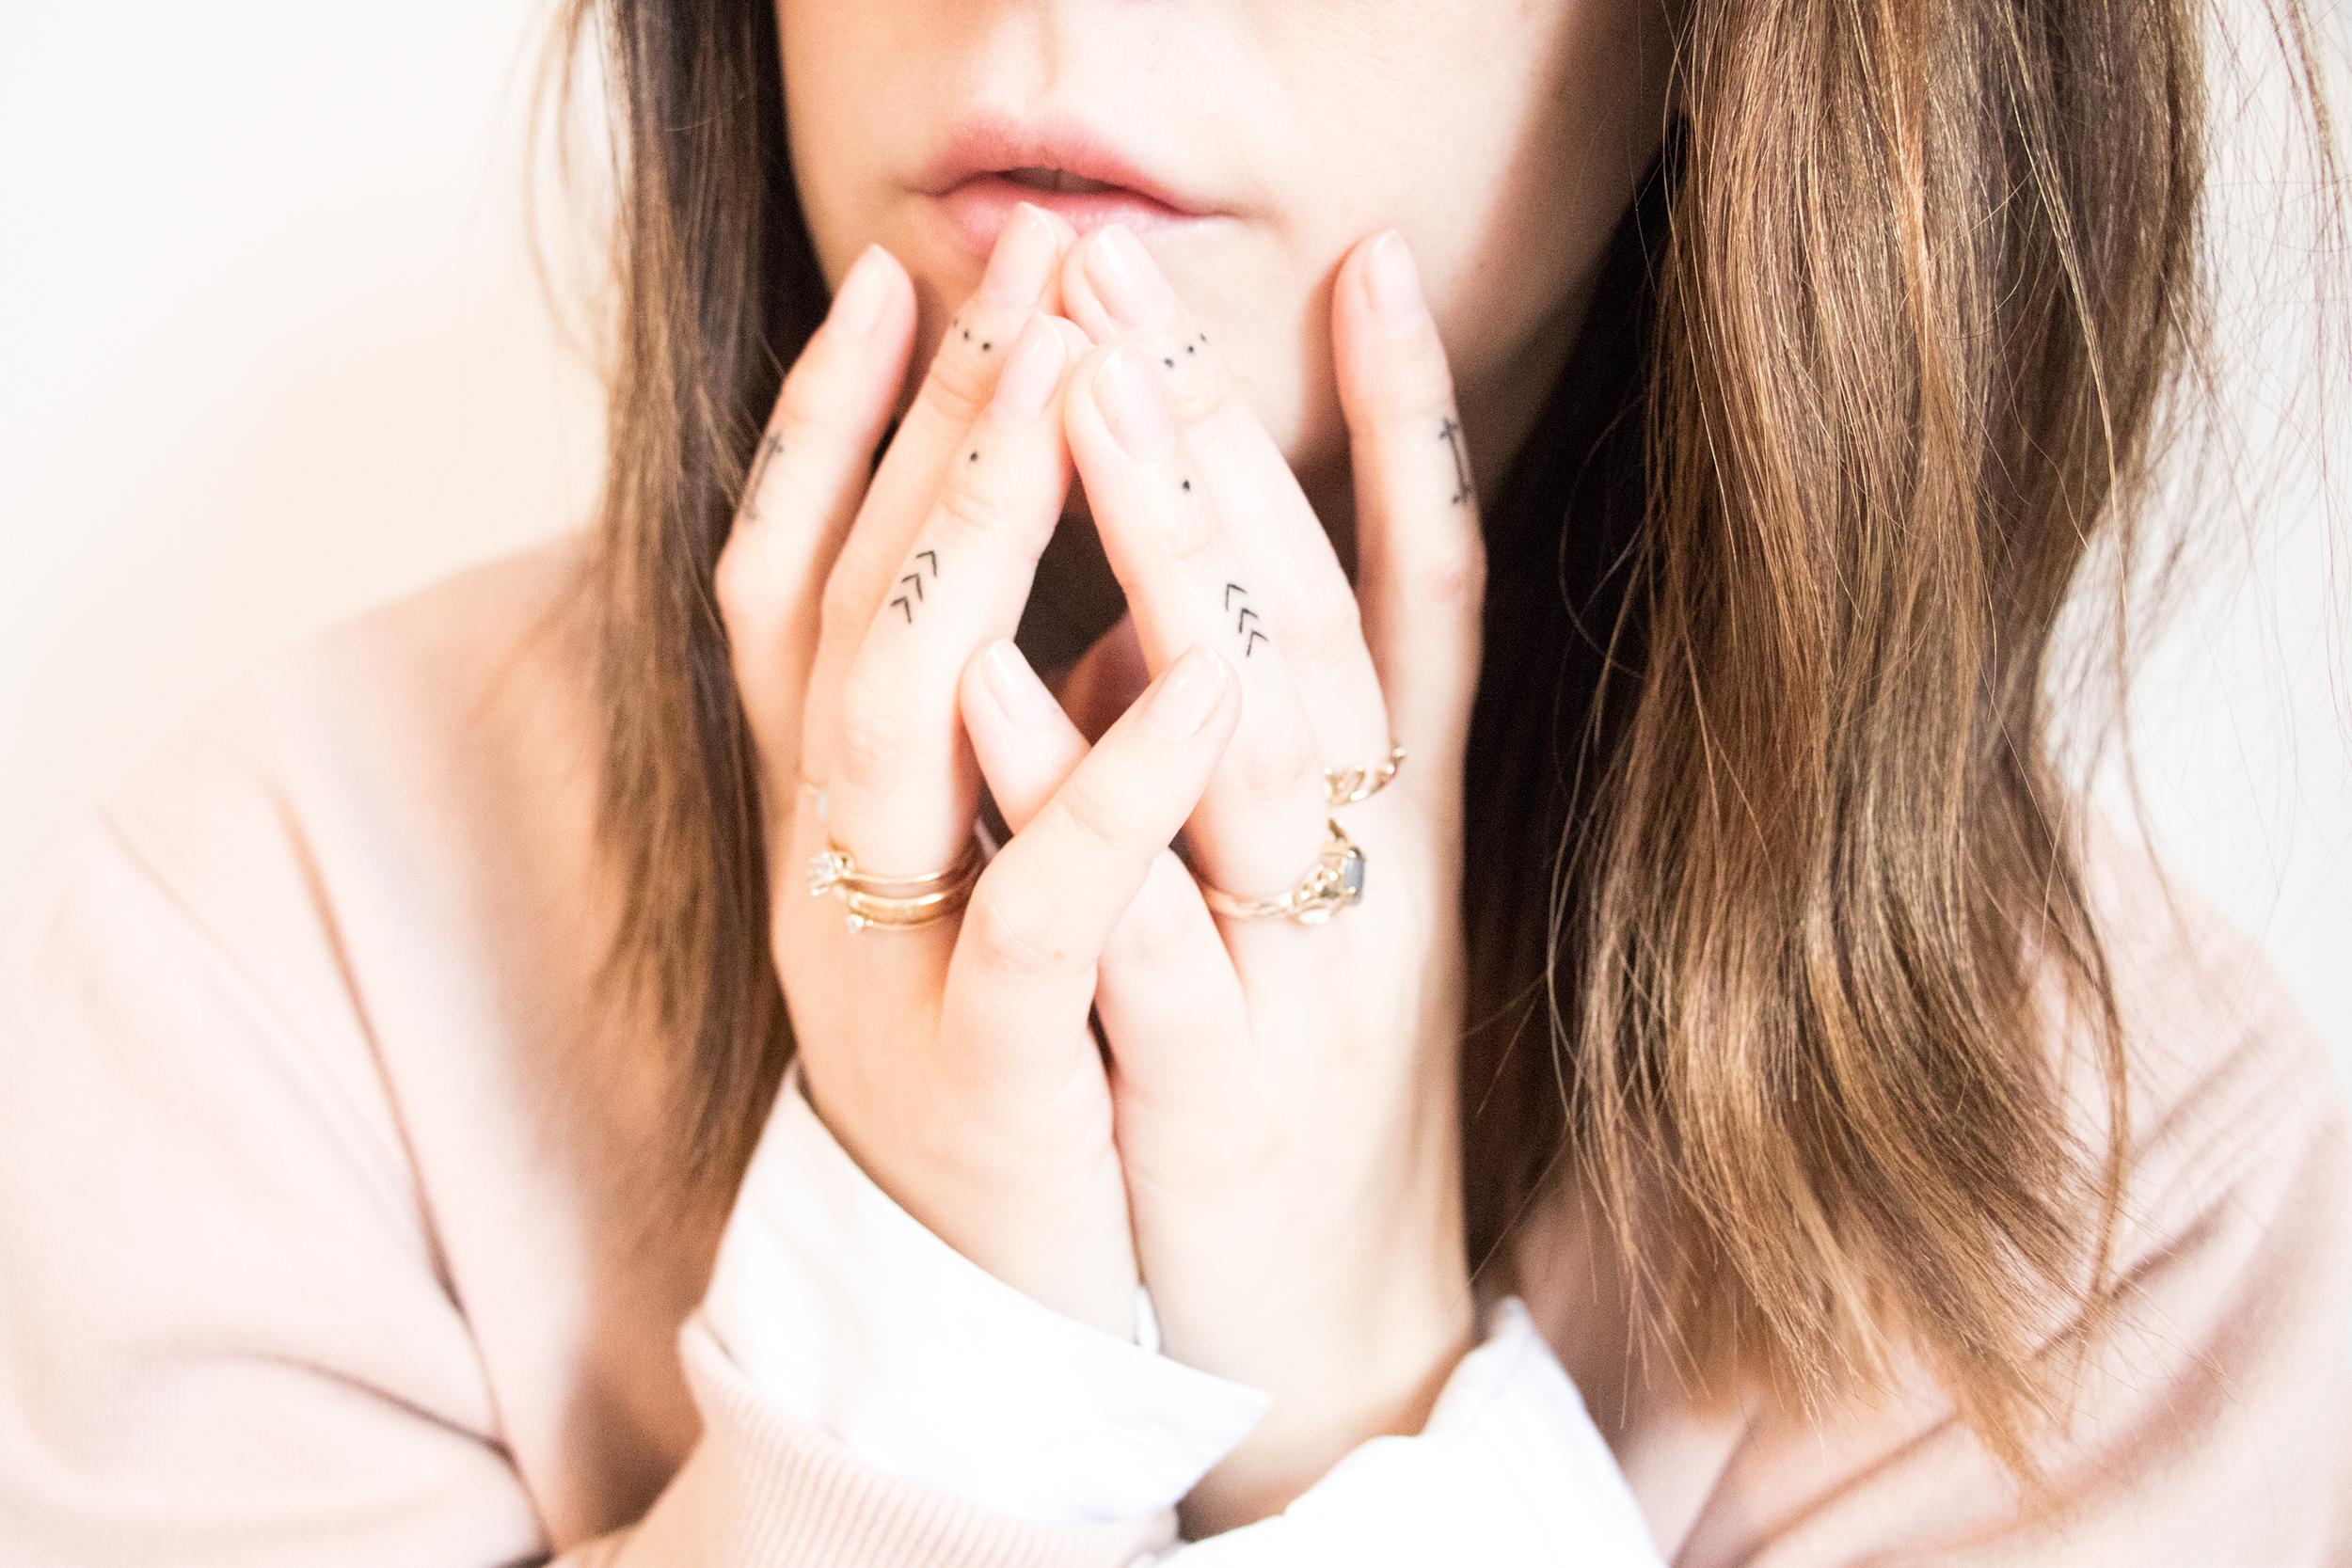 anna frost tattoo finger 1 handpoked